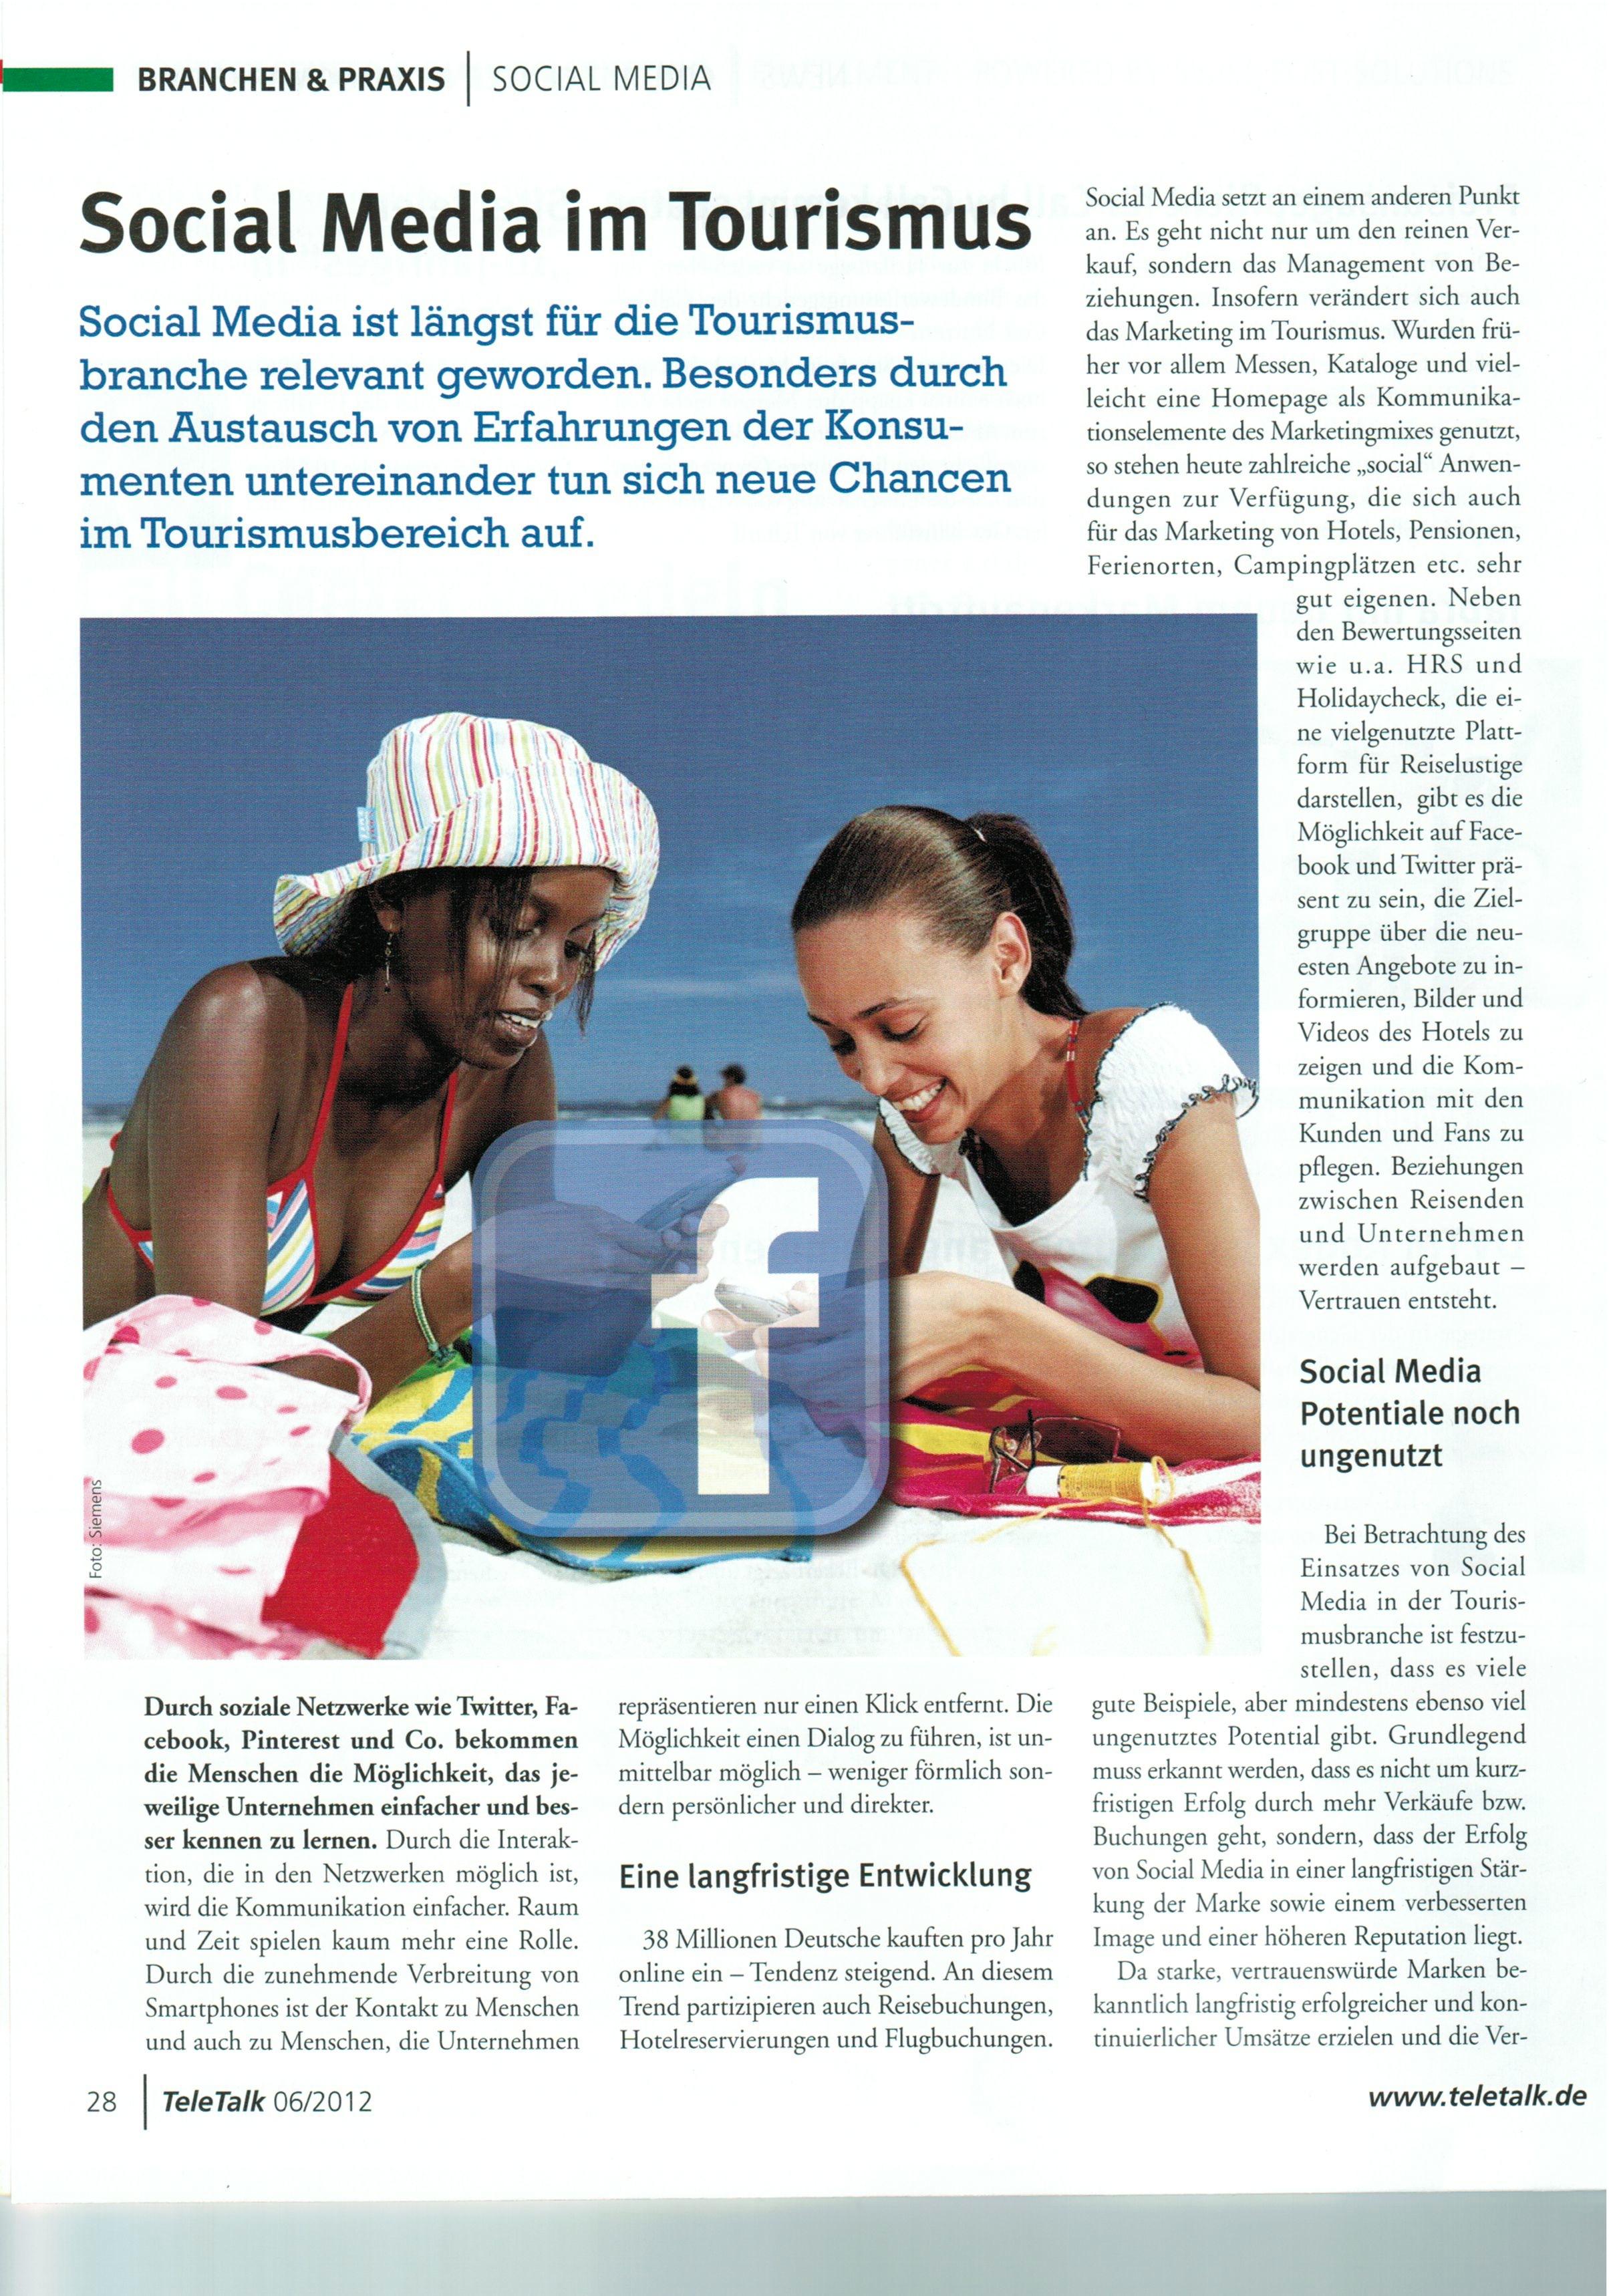 Printartikel_Teletalk_Social Media im Tourismus_2012-06-29